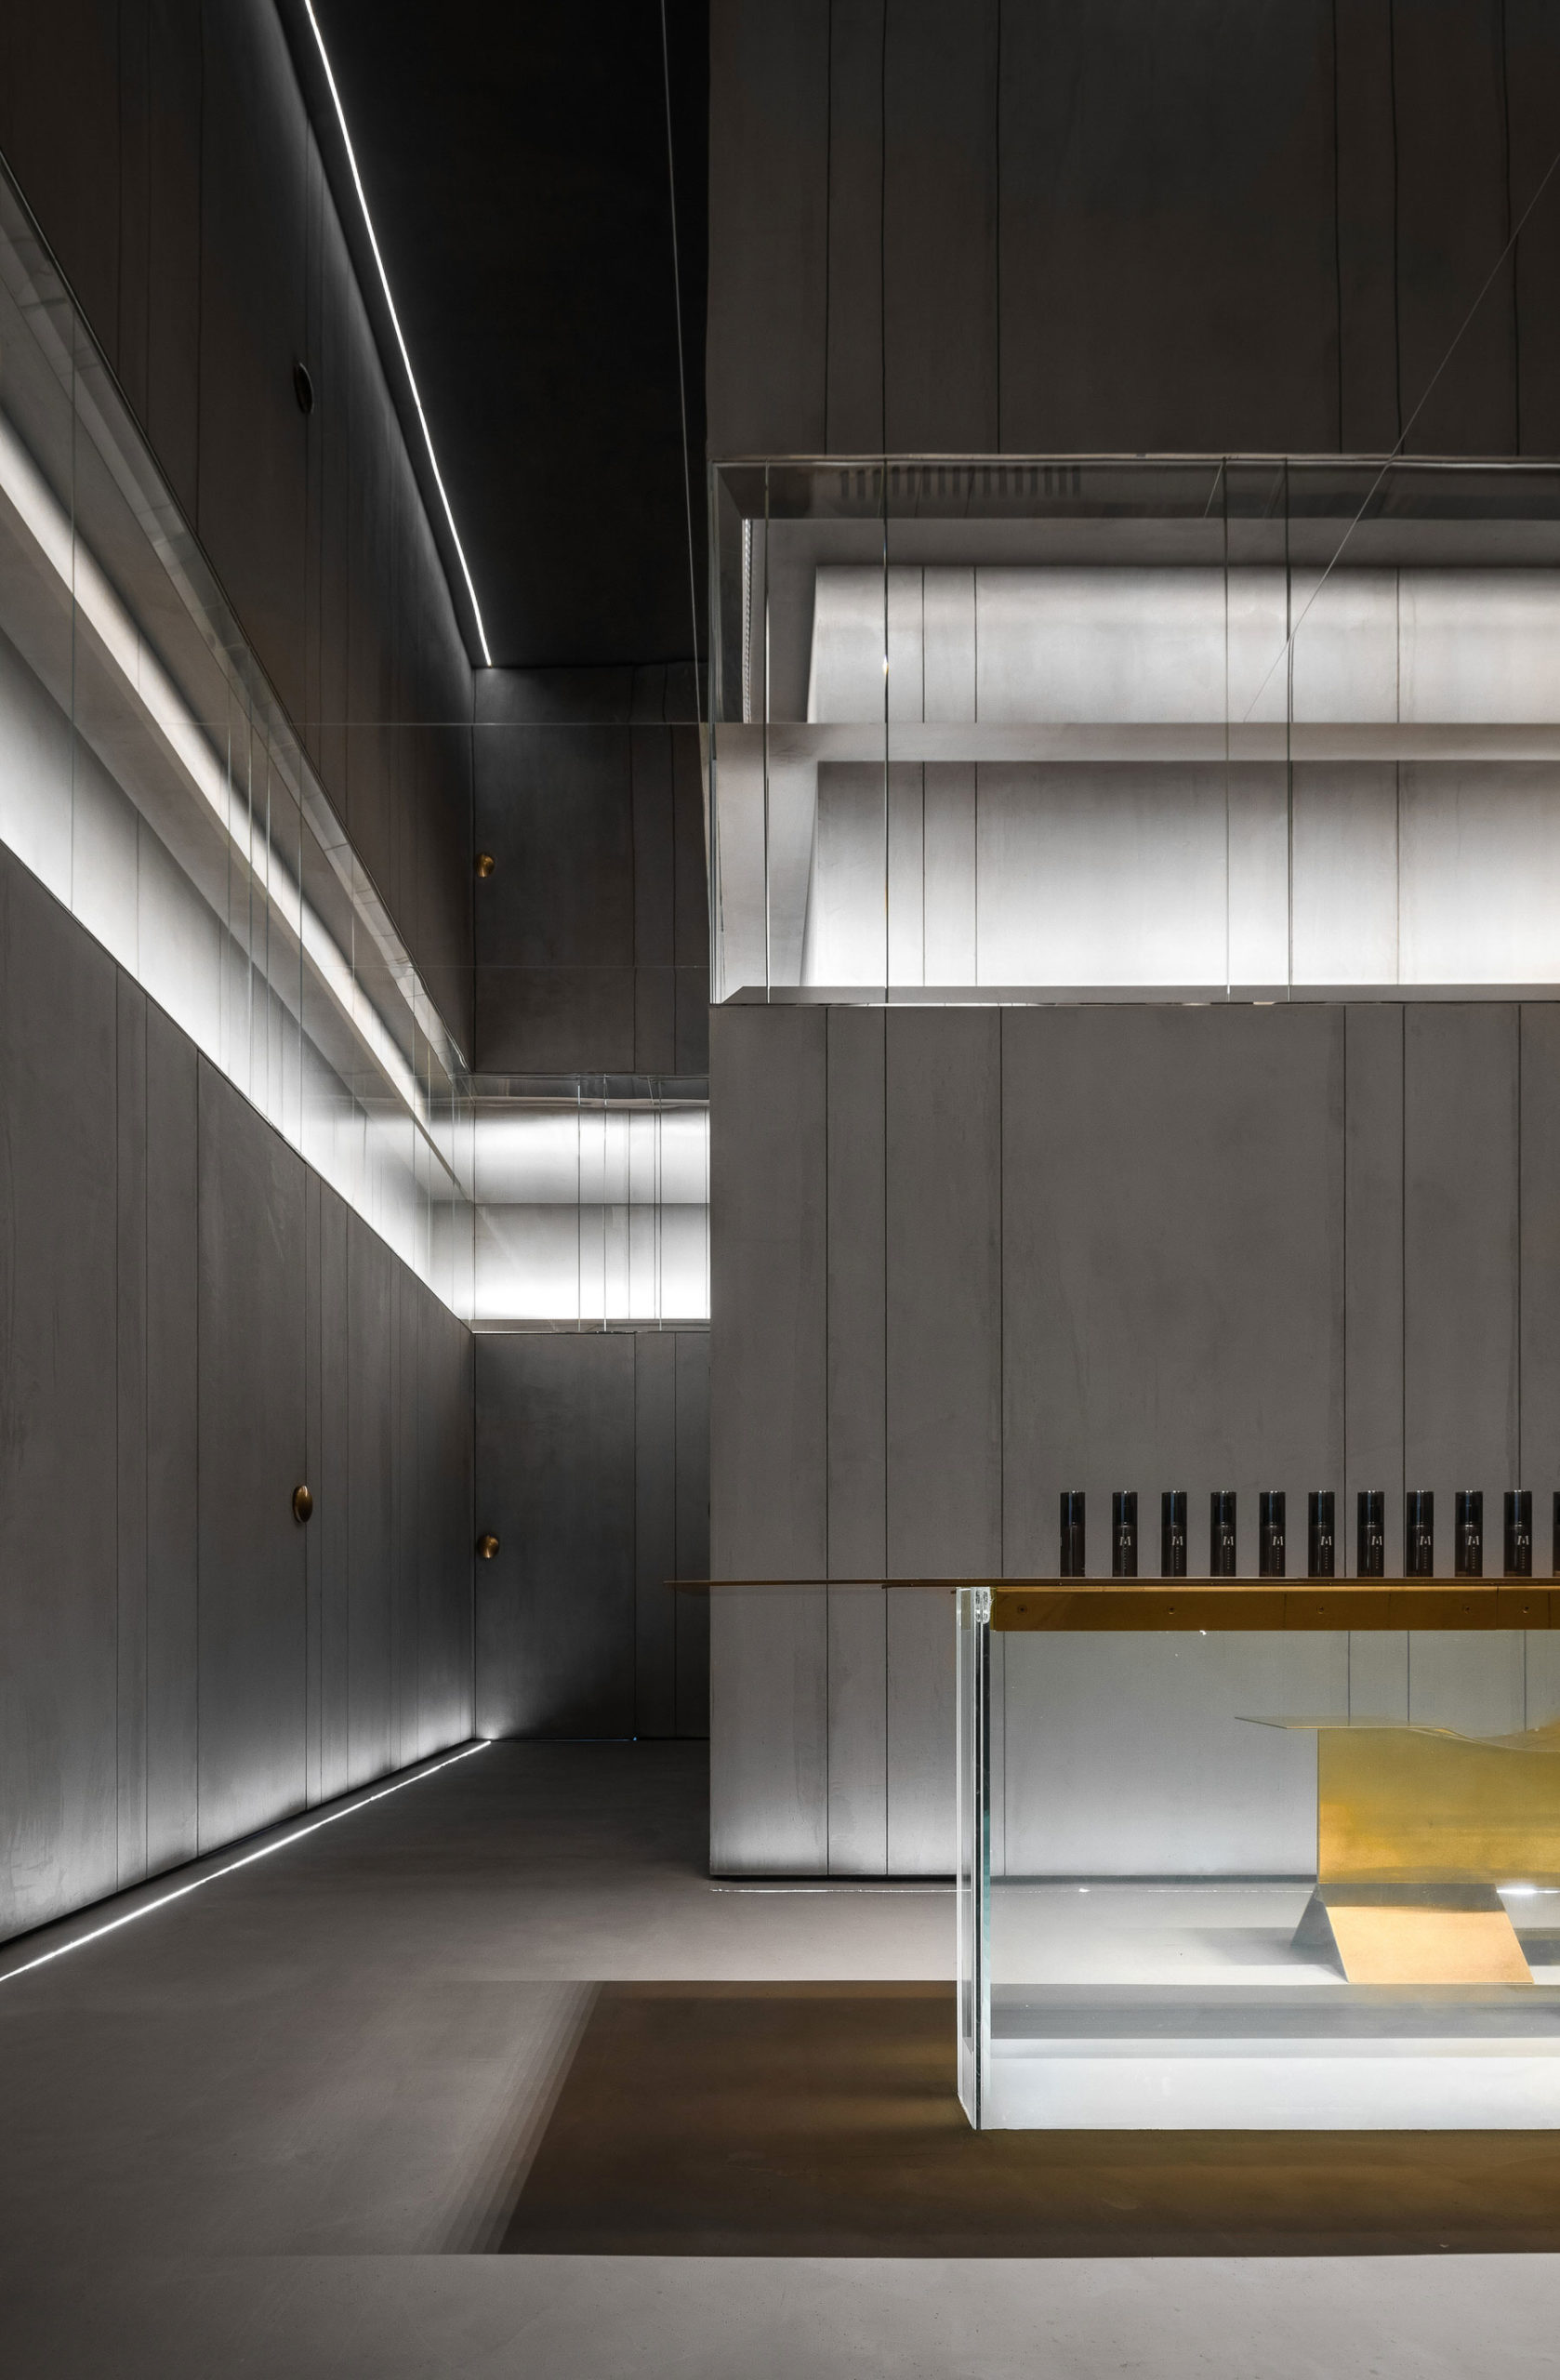 Meunier Tech Beauty Concept Store Shenzen, Domani, Luxury Retail China | Yellowtrace